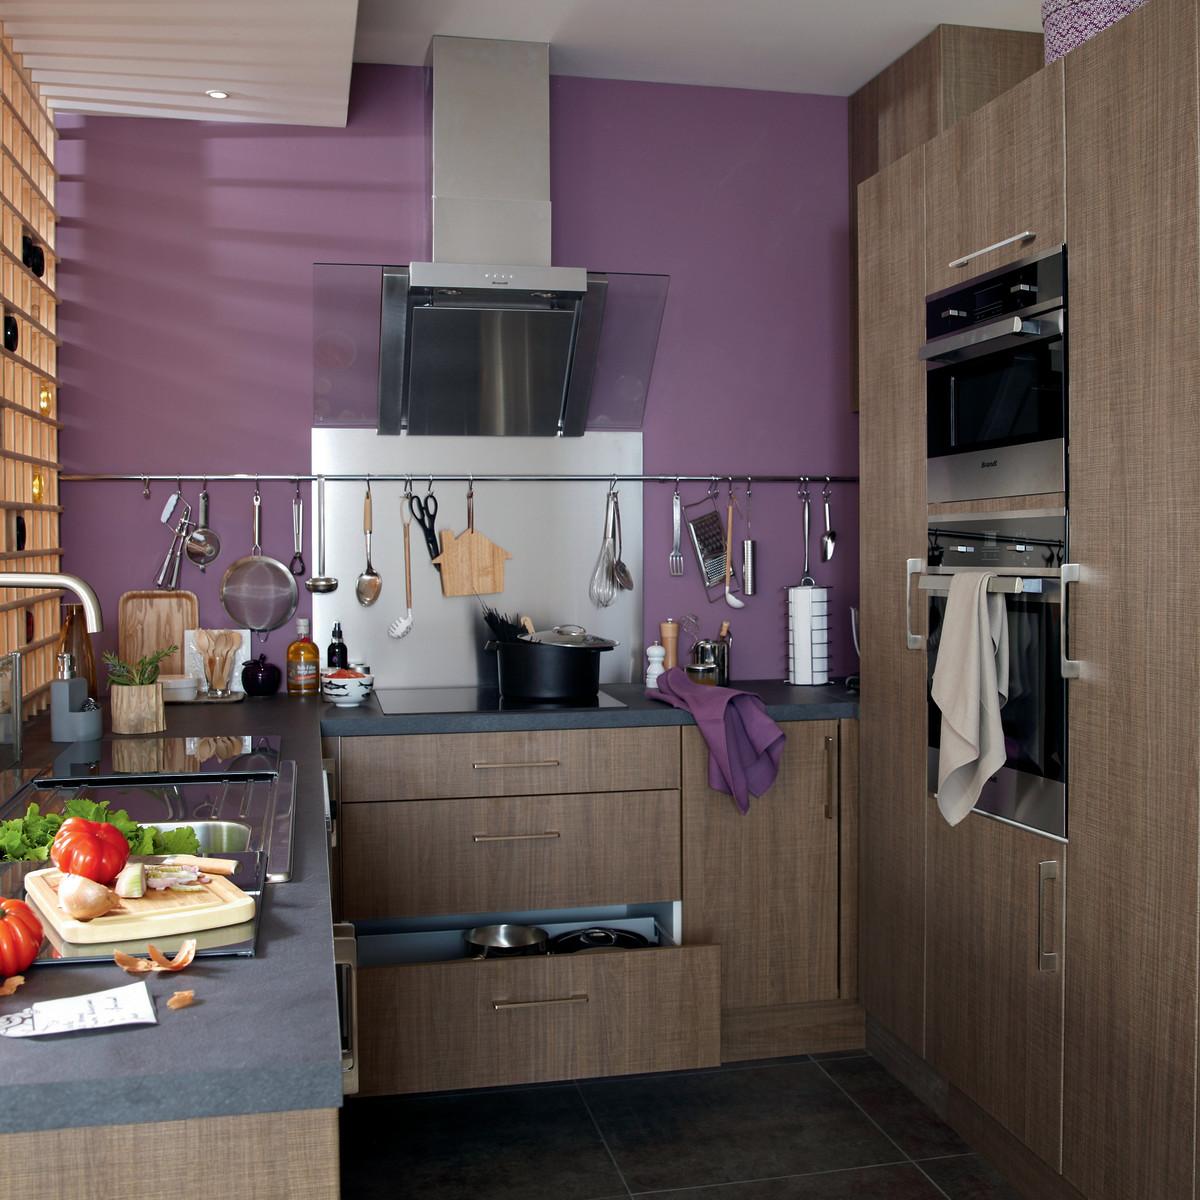 Plafoniere x cucina - Cucina 3 metri angolare ...